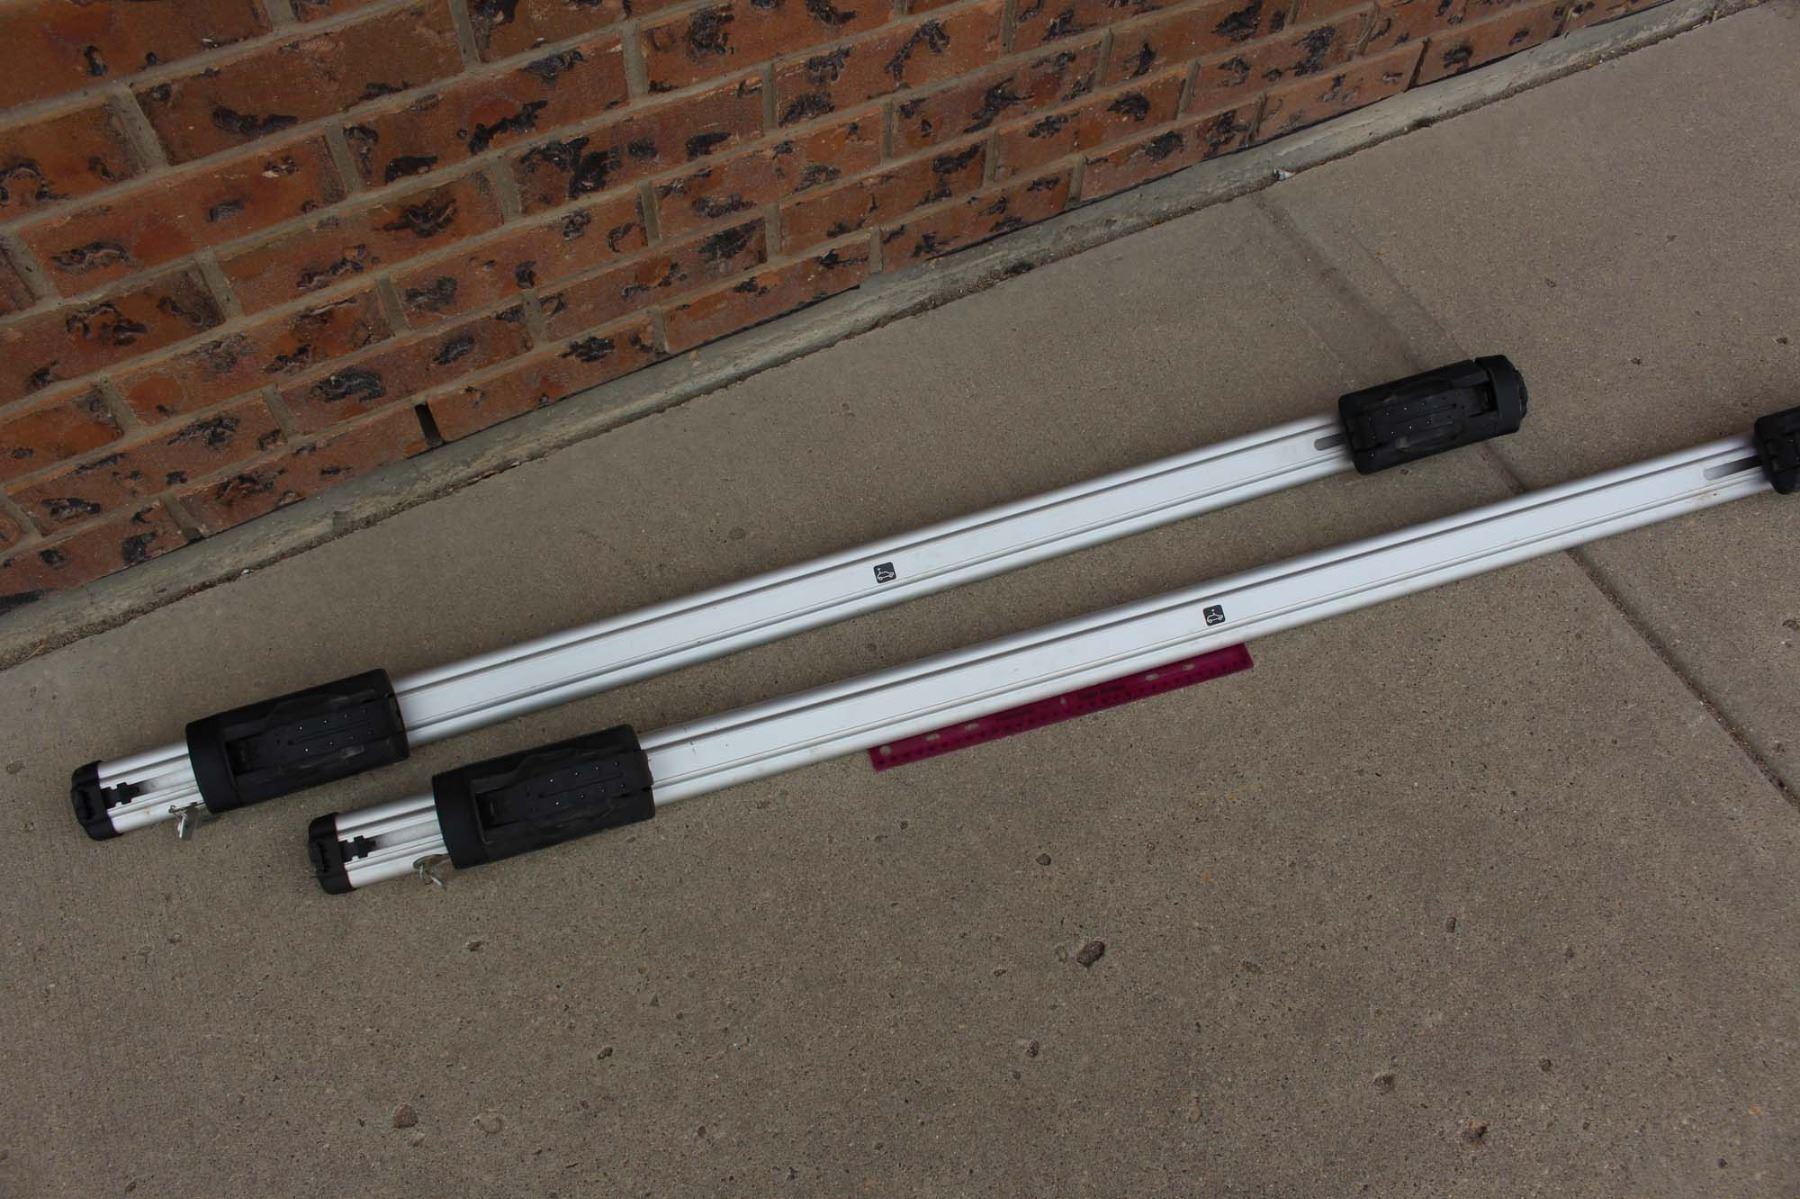 Thule Brand Vehicle Roof Storage Racks W/ Key